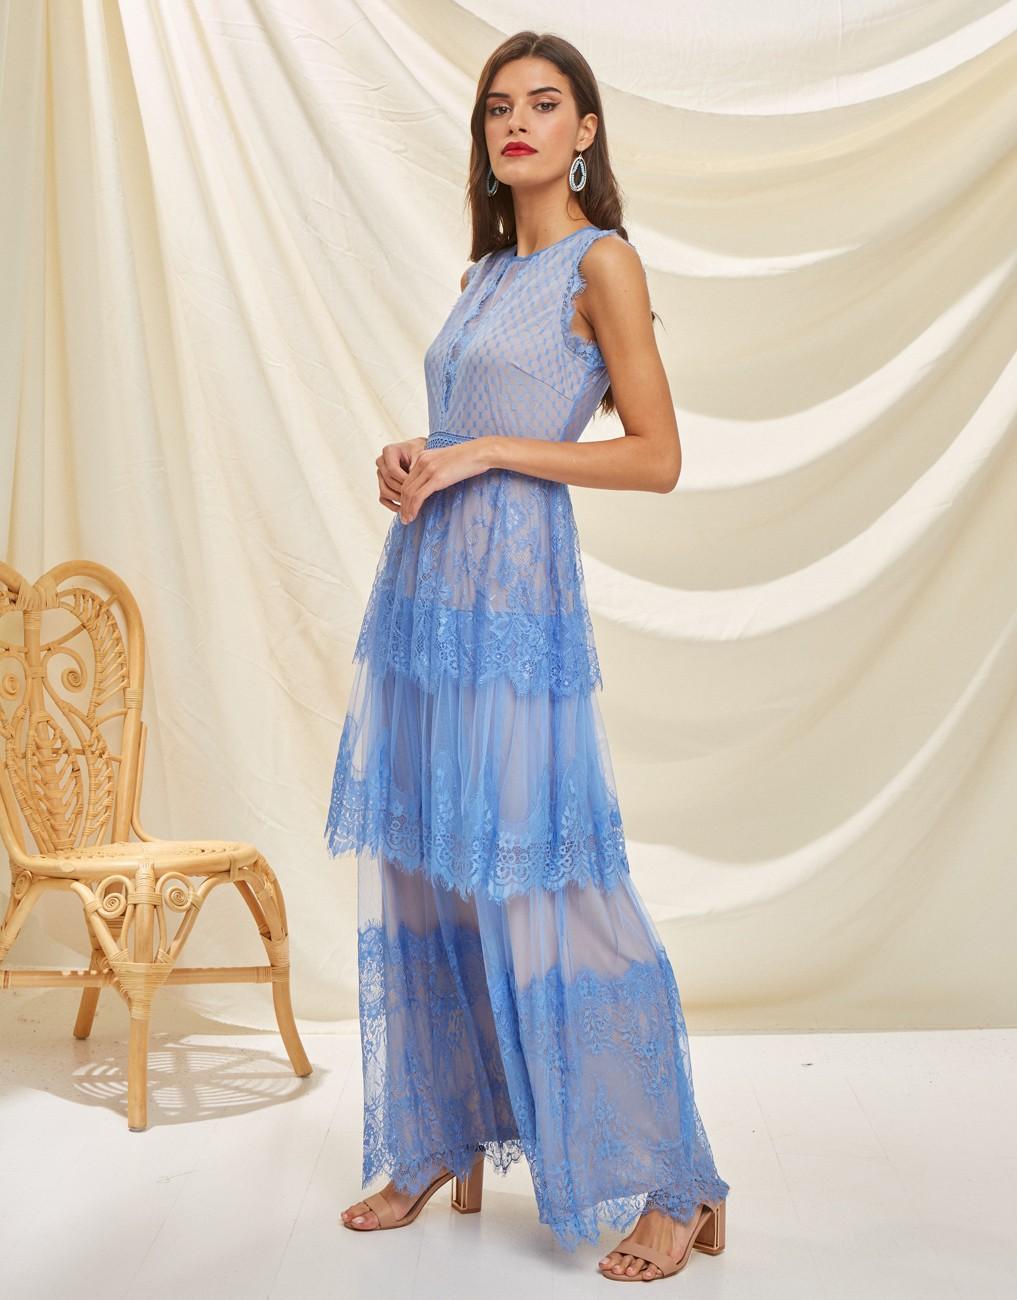 Maxi full lace dress